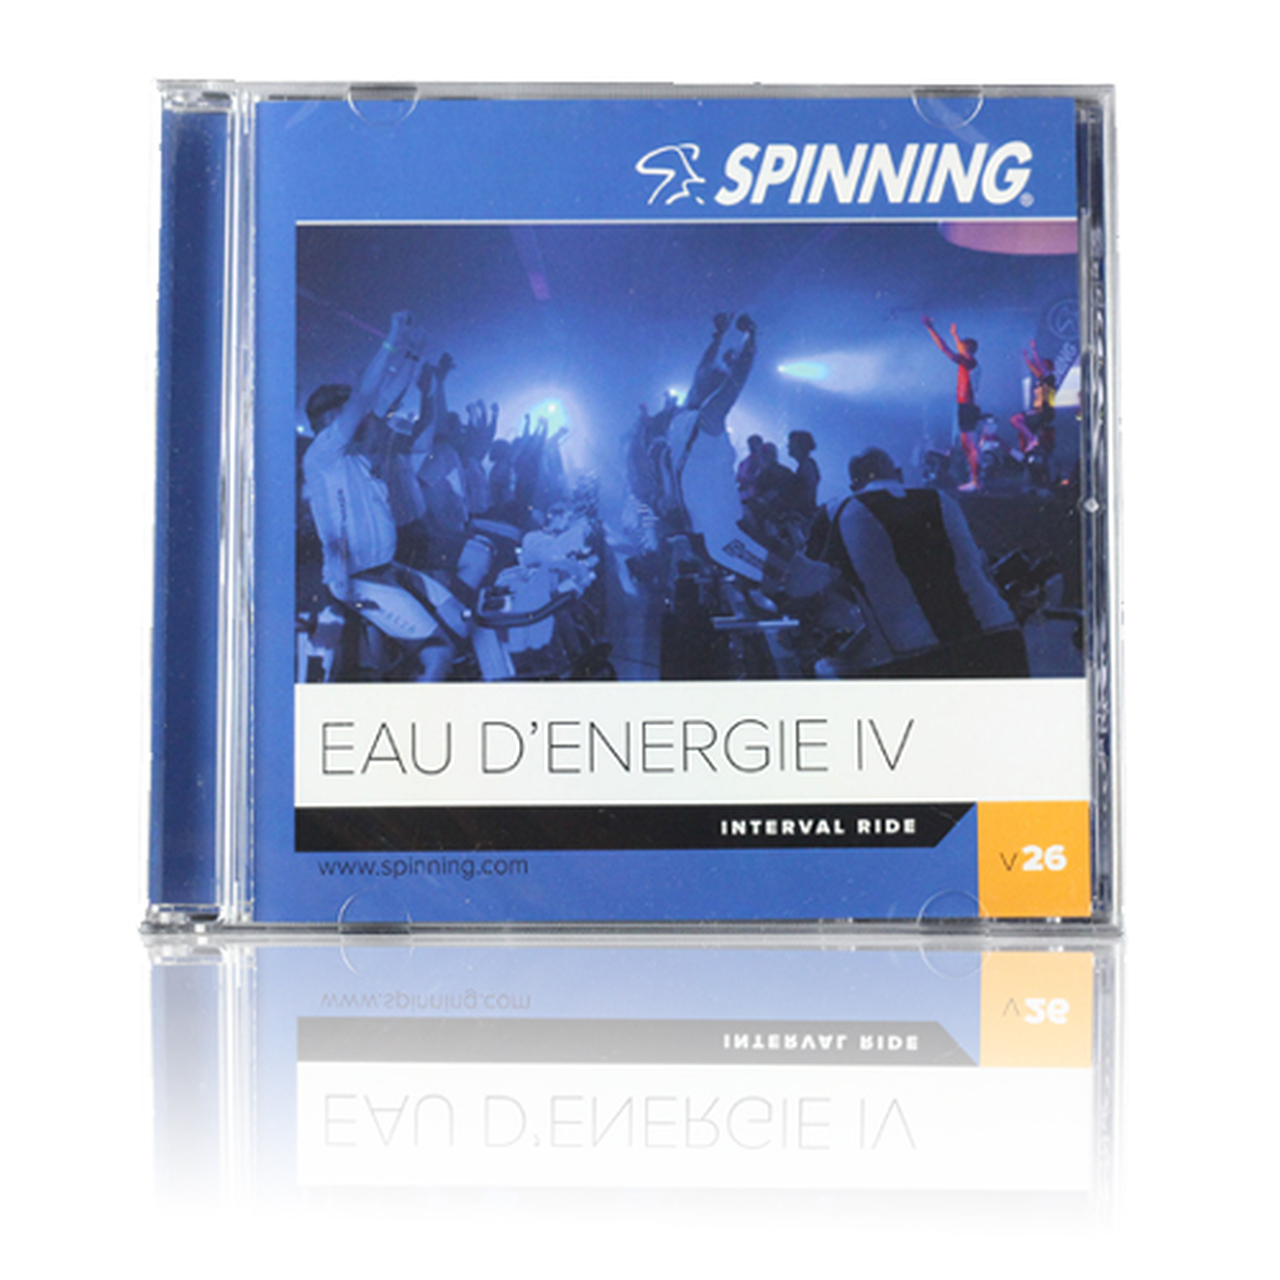 Spinning® CD Volume 26 | Eau D'Energie IV